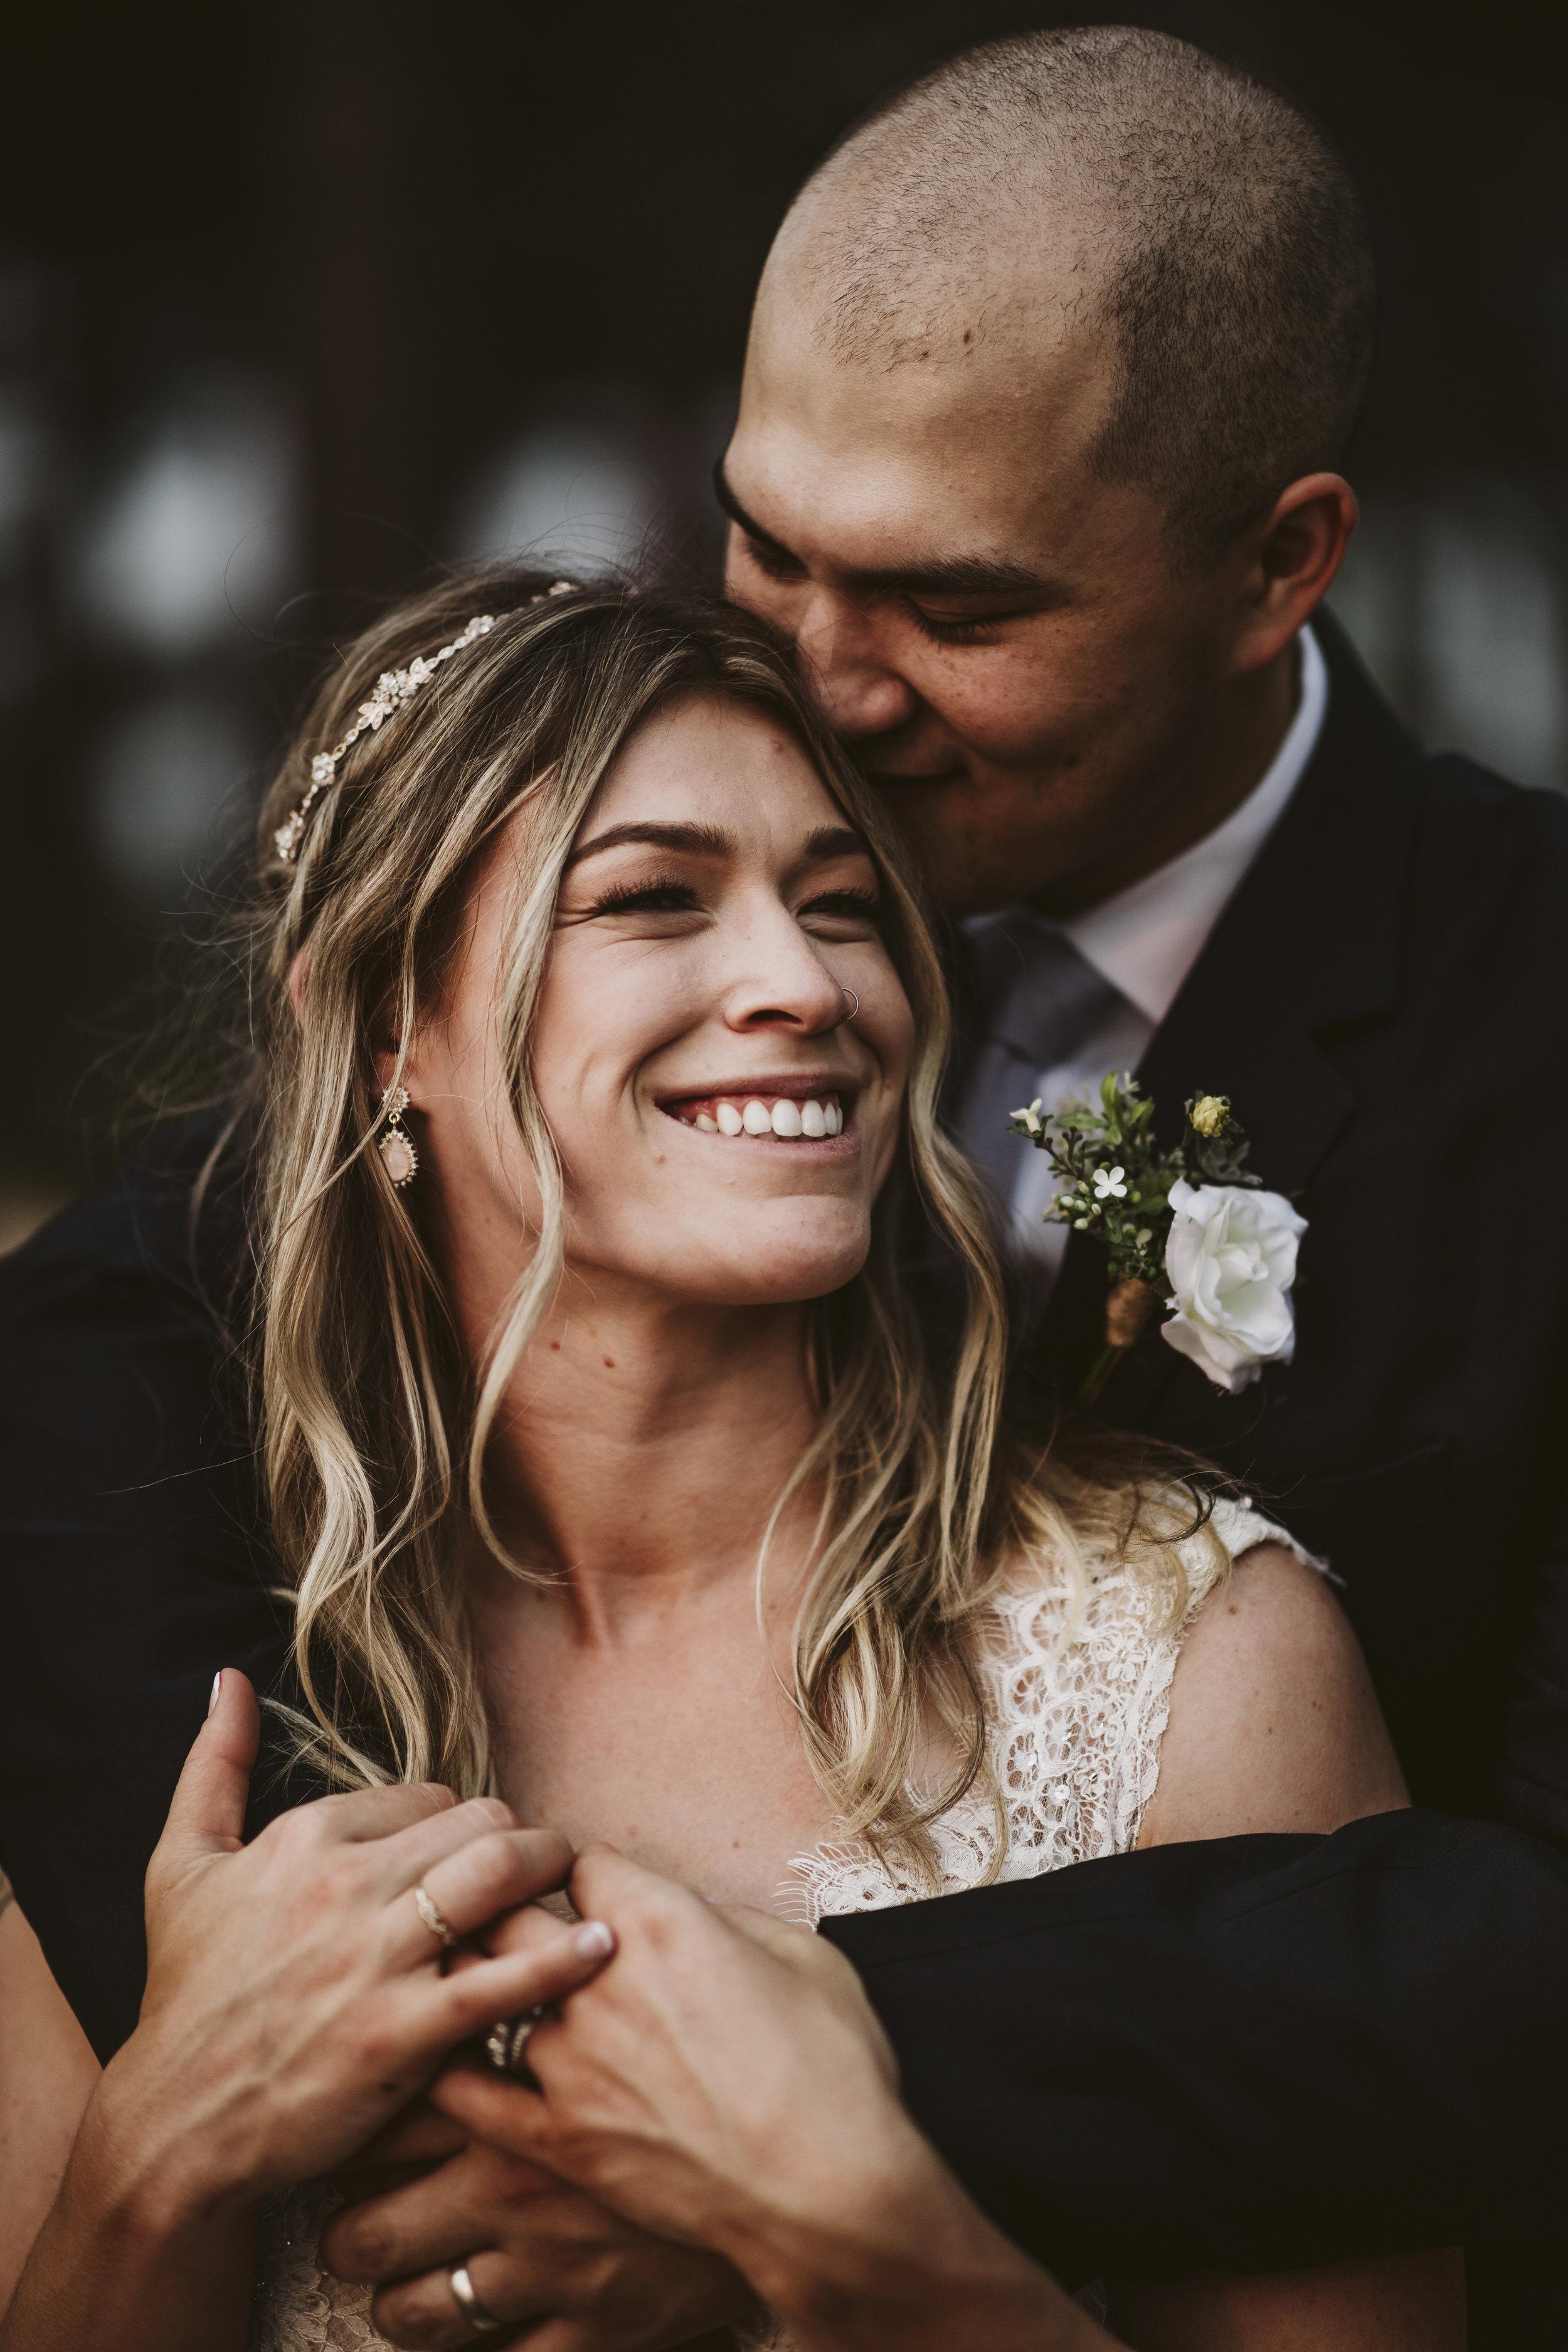 _P8A5602vild-vild photography-photography-wedding-wedding photography-tahoe-lake tahoe-lake tahoe wedding photographer-nevada wedding photographer-mountain wedding.jpg